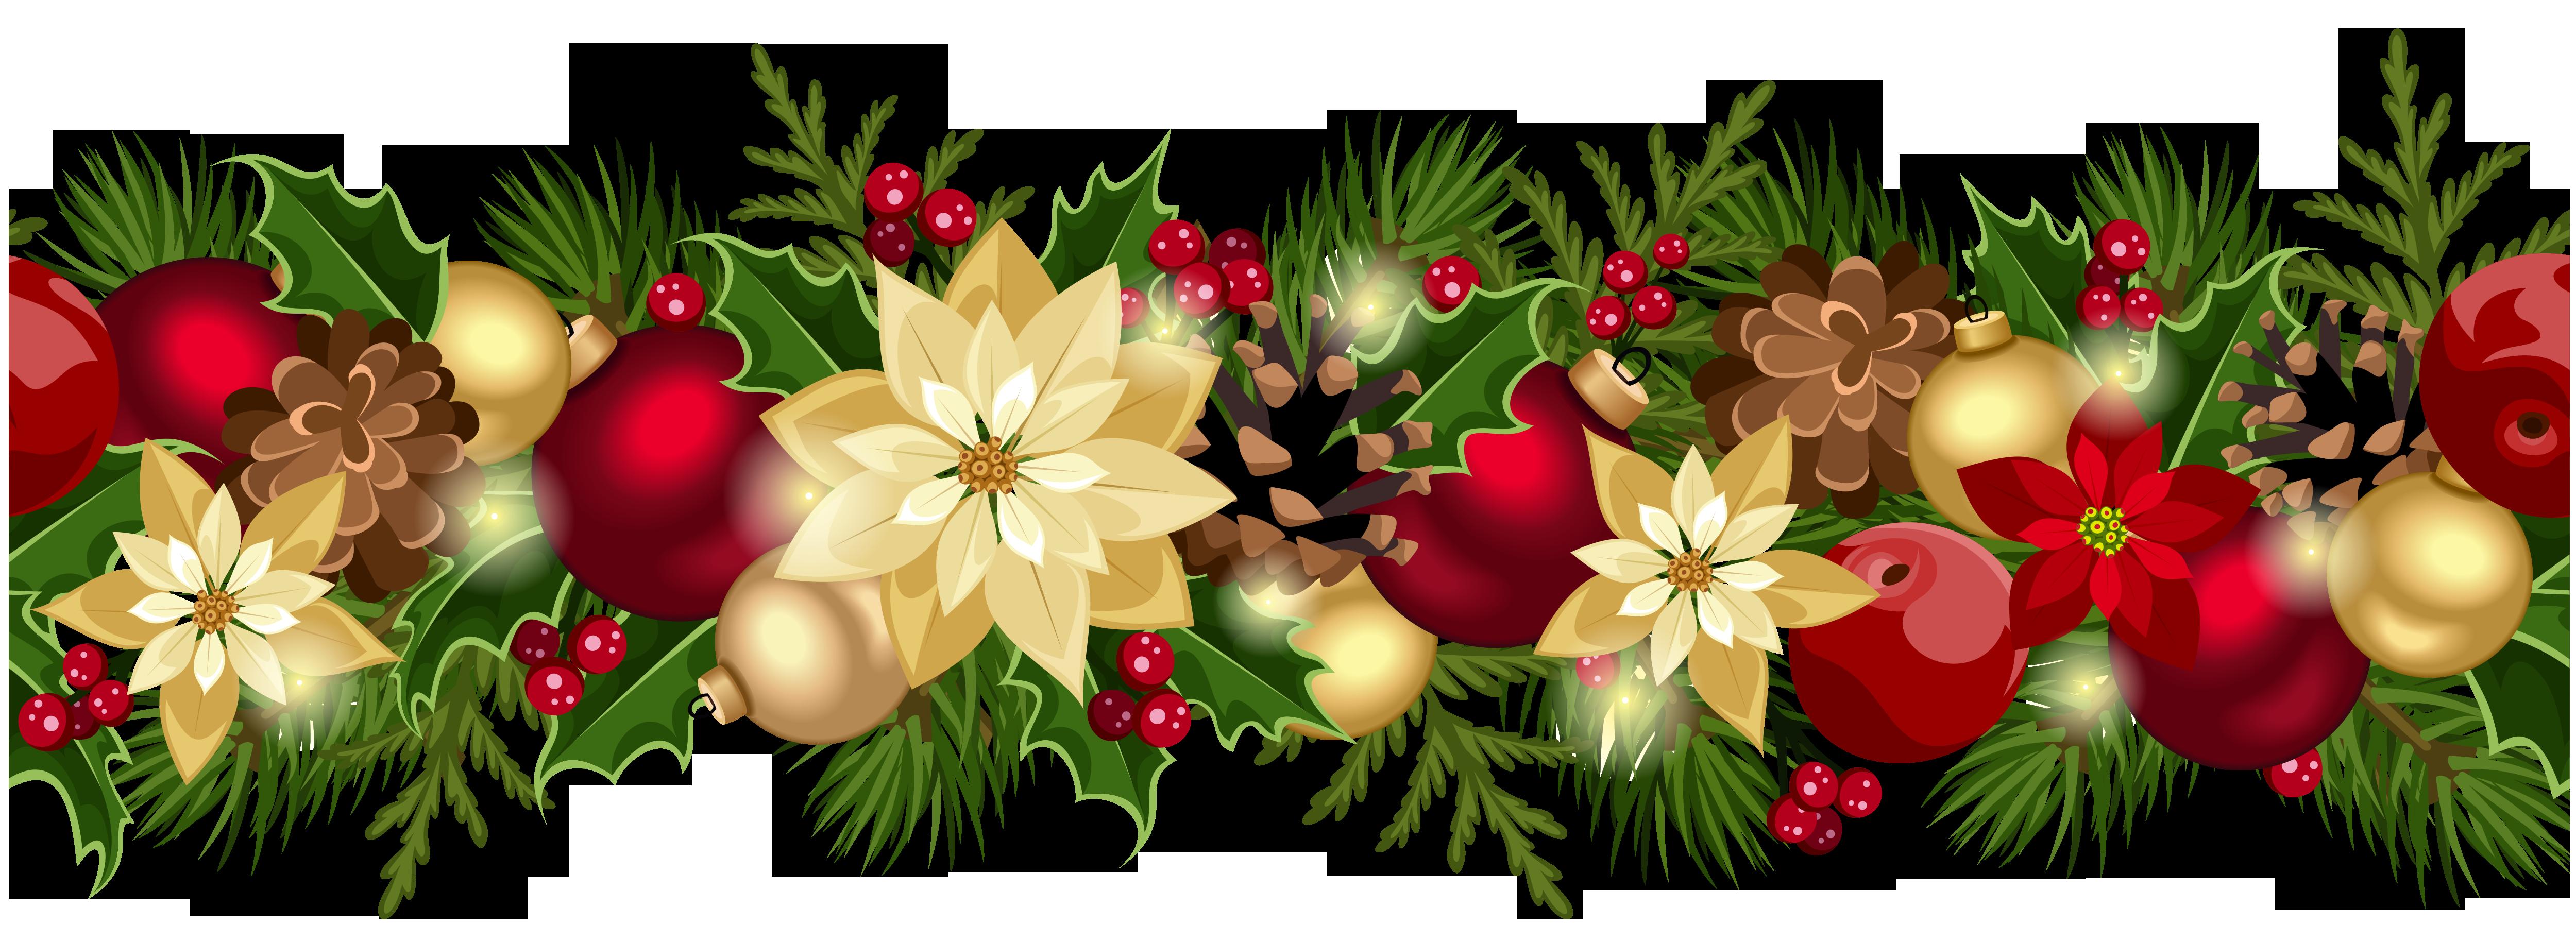 Christmas-Garland-Clip-Art-18.png